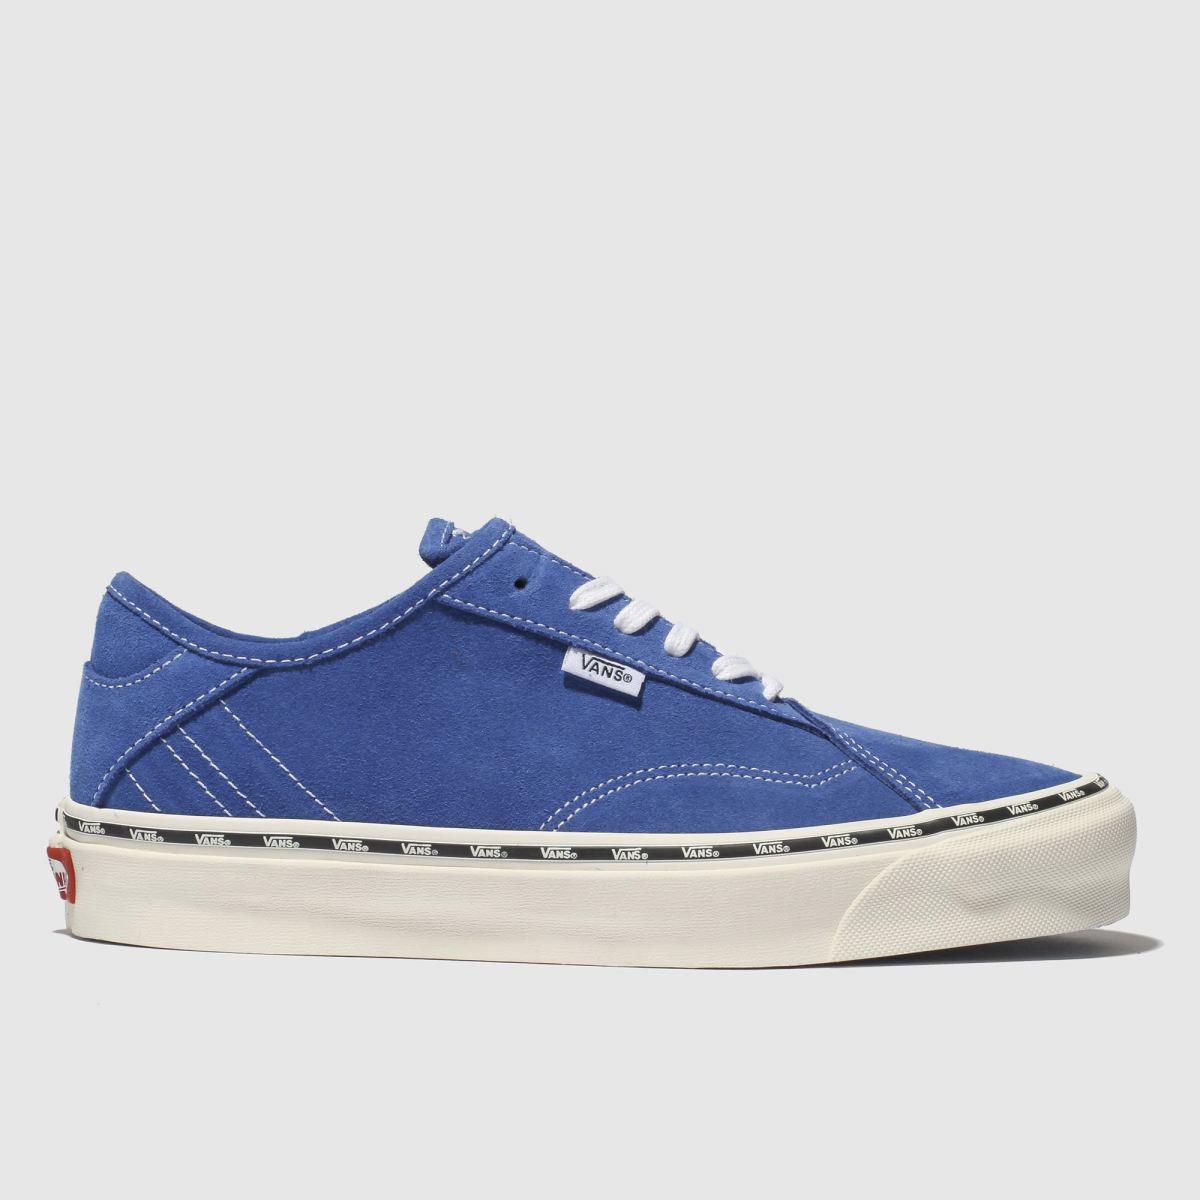 Vans Blue Diamo Ni Trainers